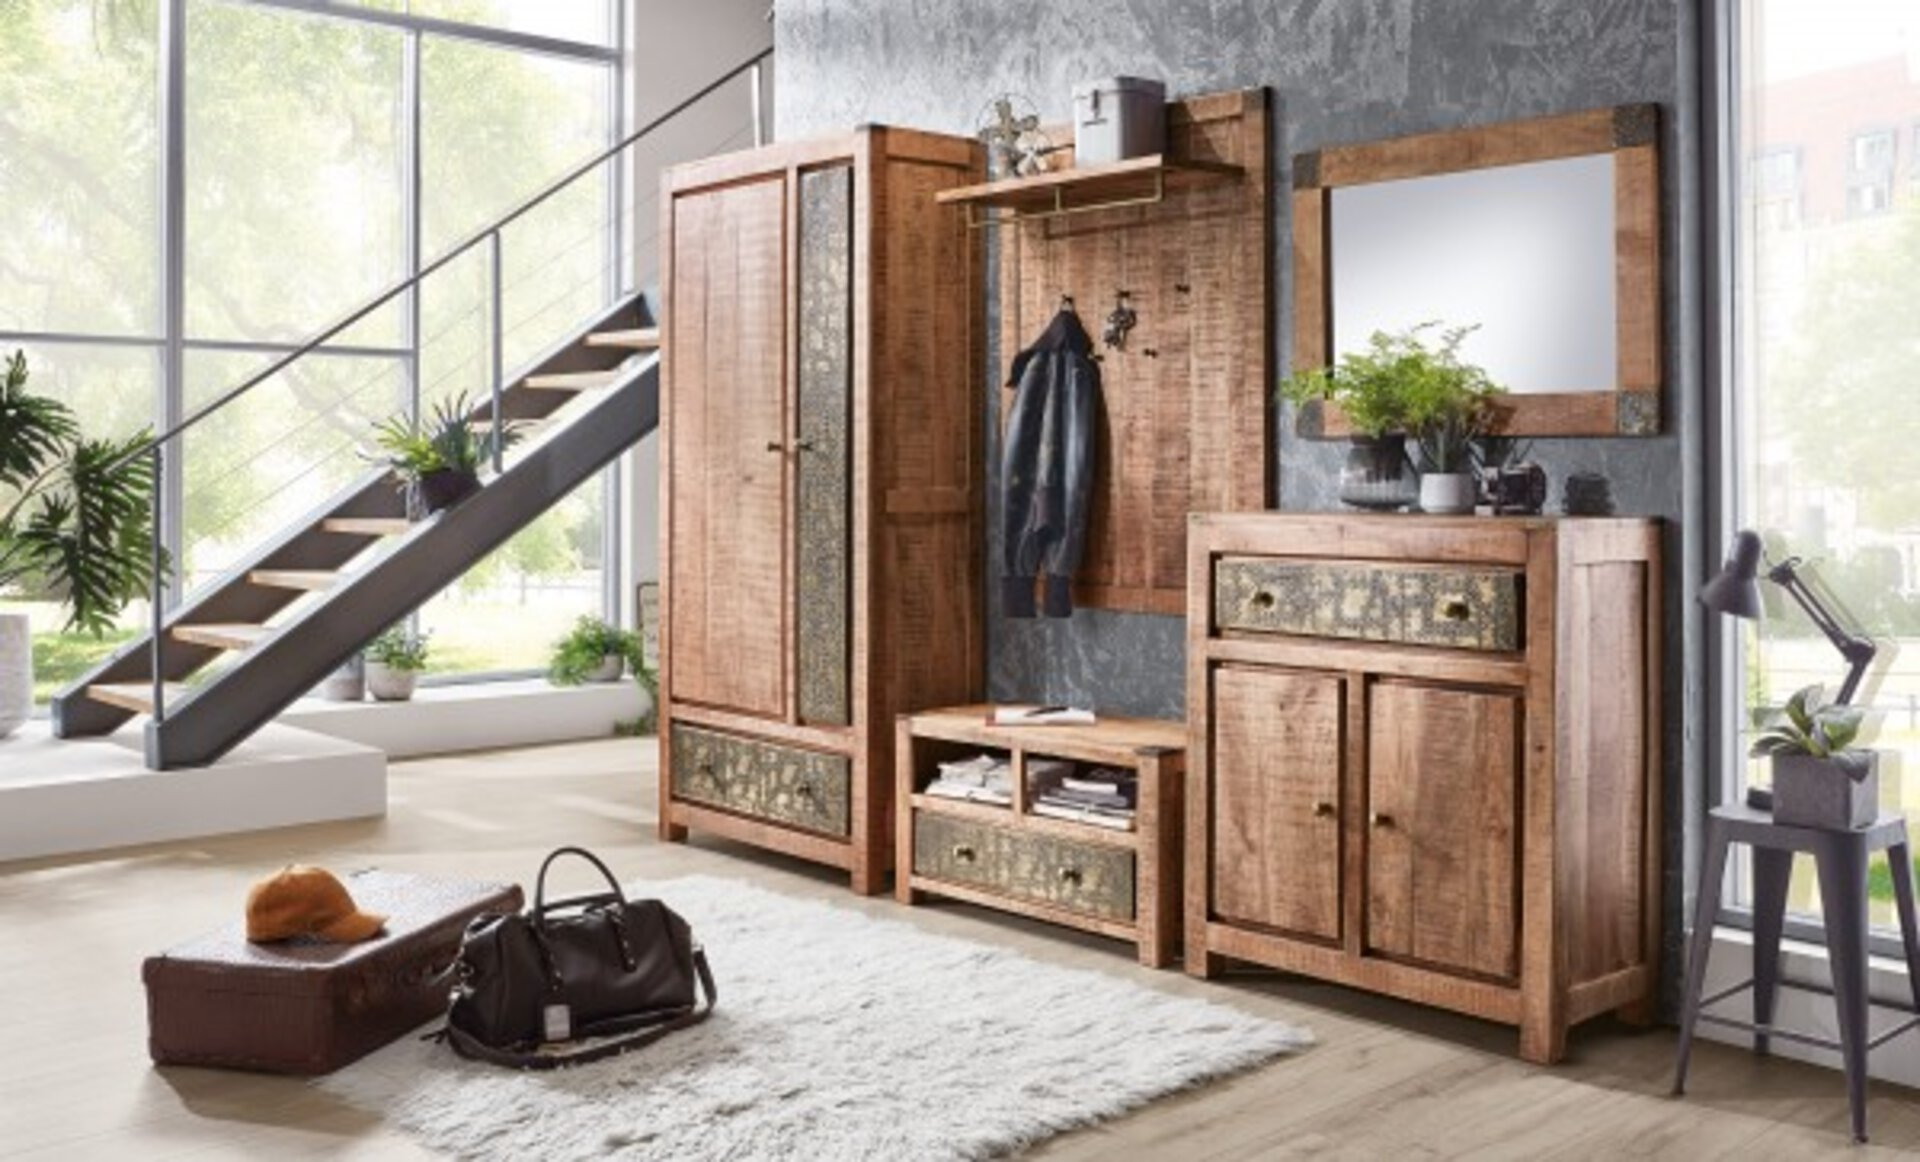 Garderobenschrank CURL Vito Holz mehrfarbig 40 x 200 x 100 cm